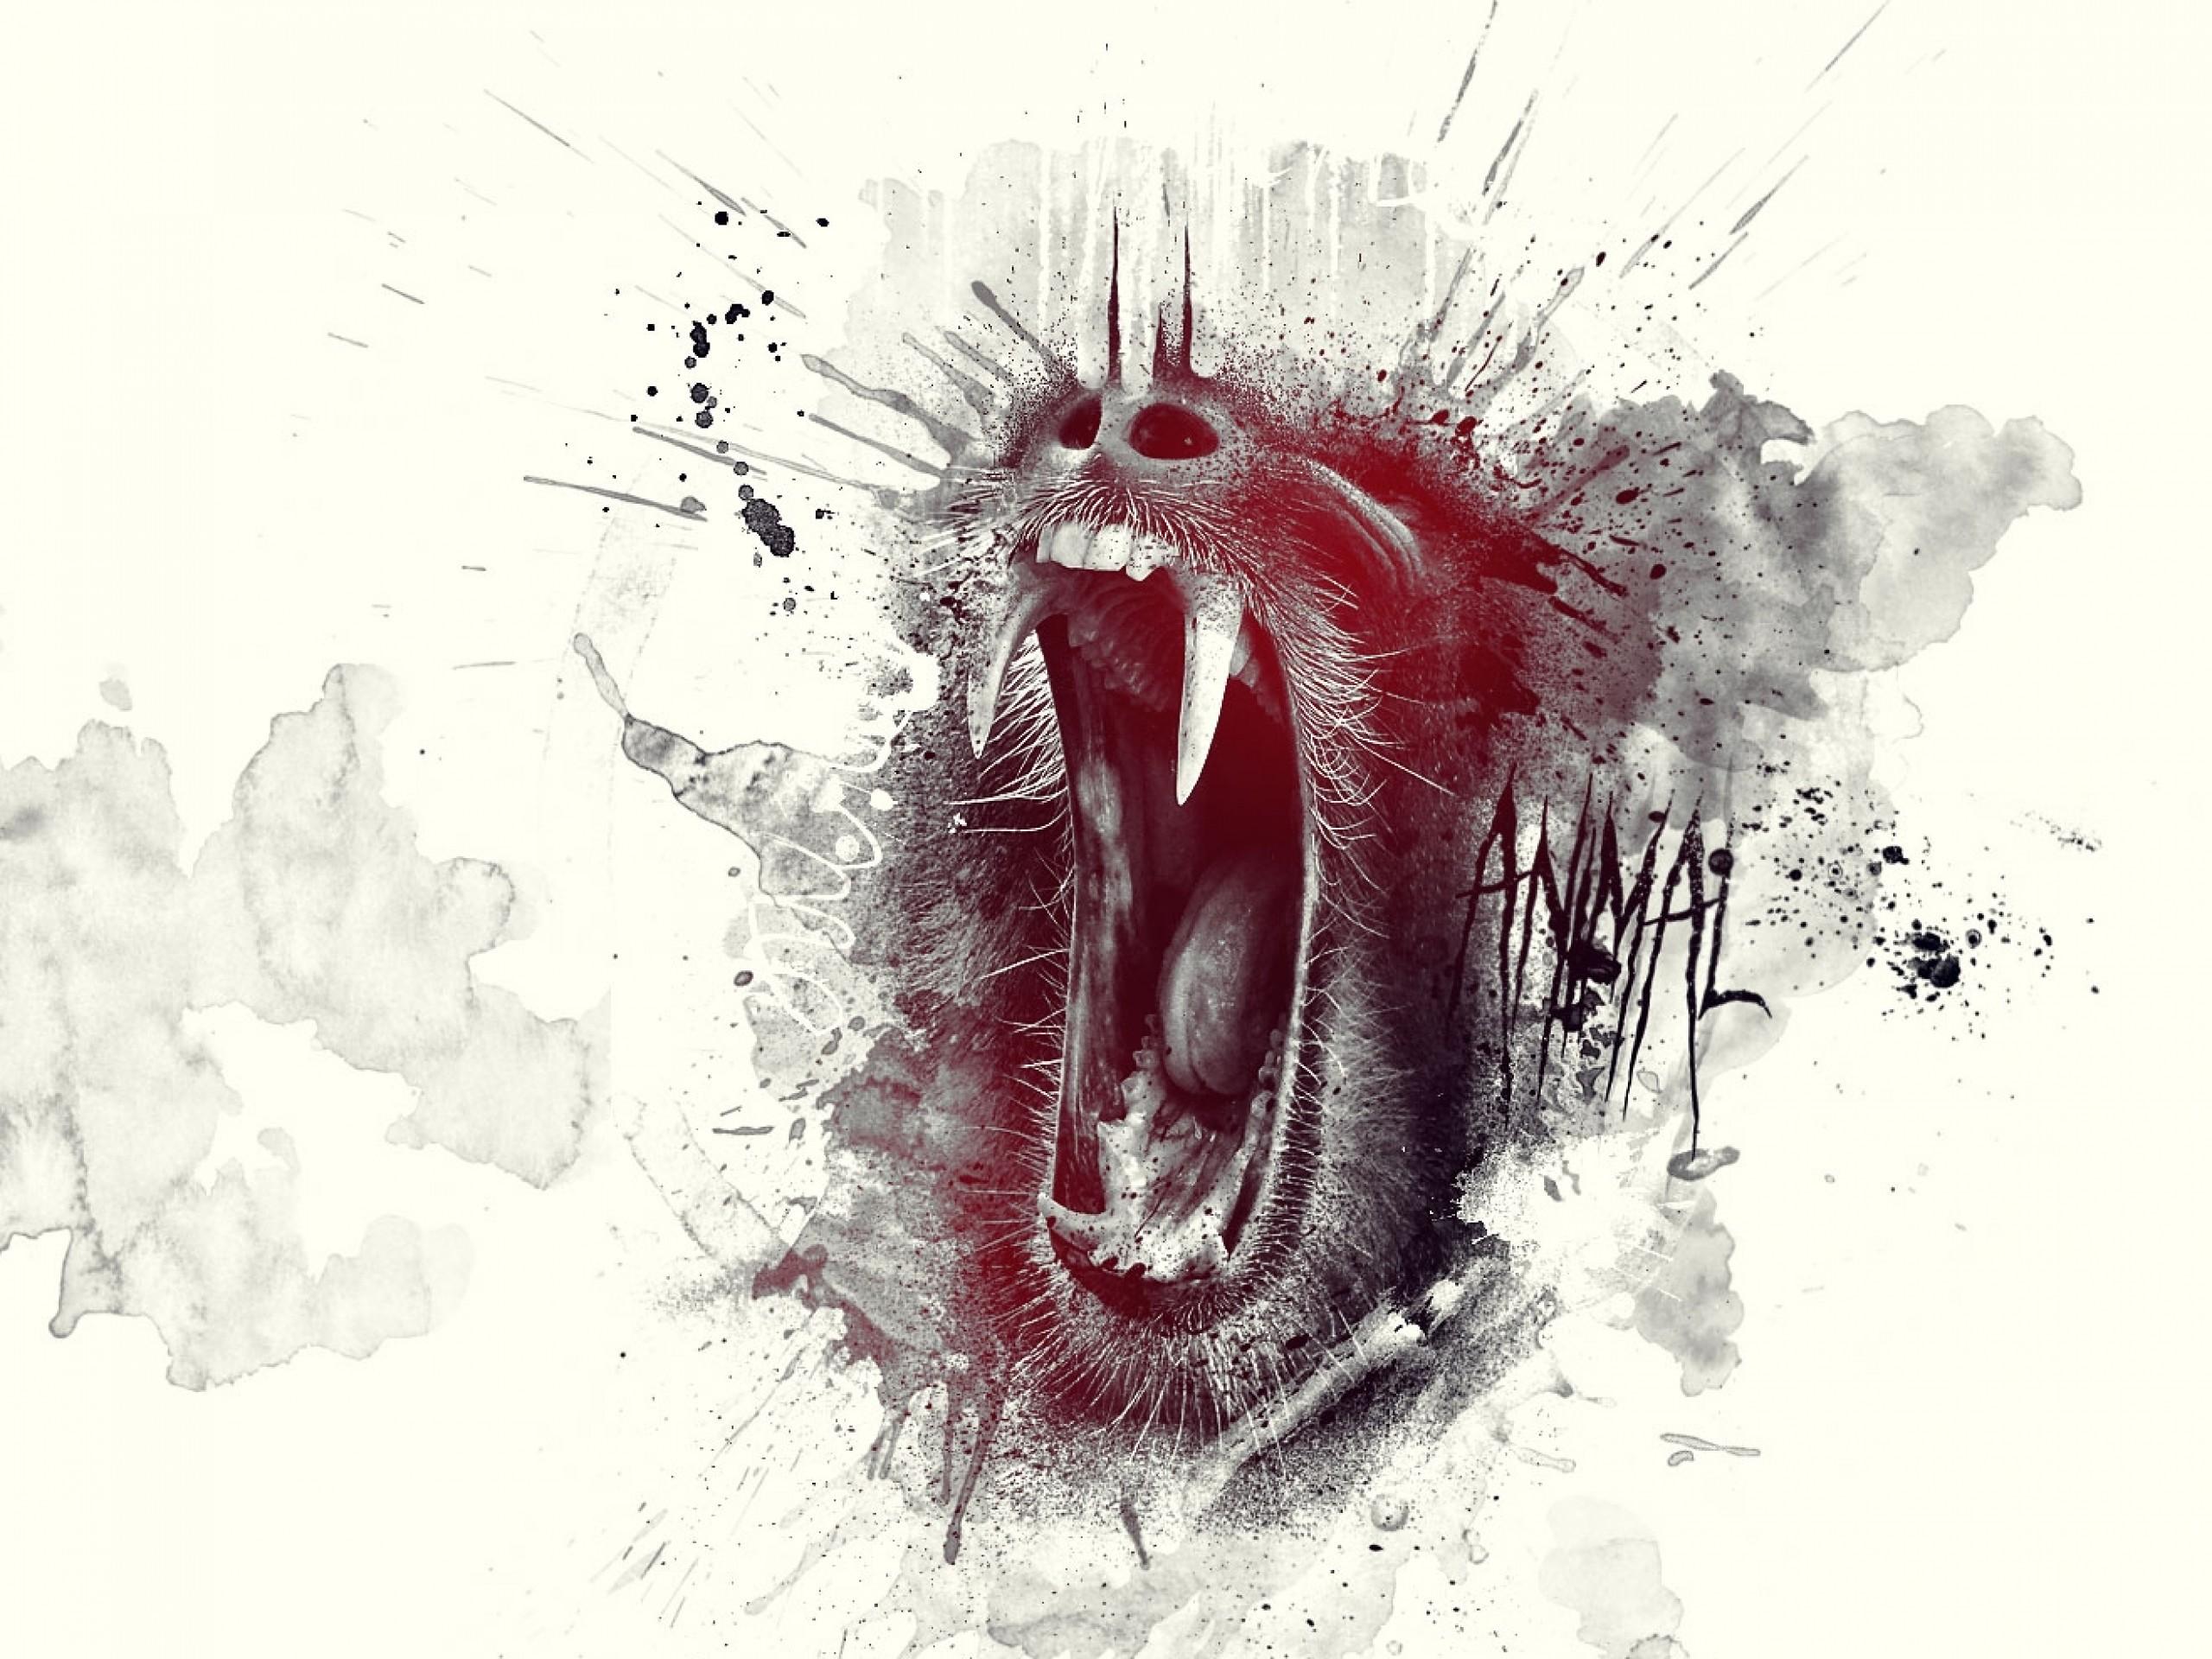 Beast Wallpapers 42 Desktop Images of Beast Beast 2560x1920